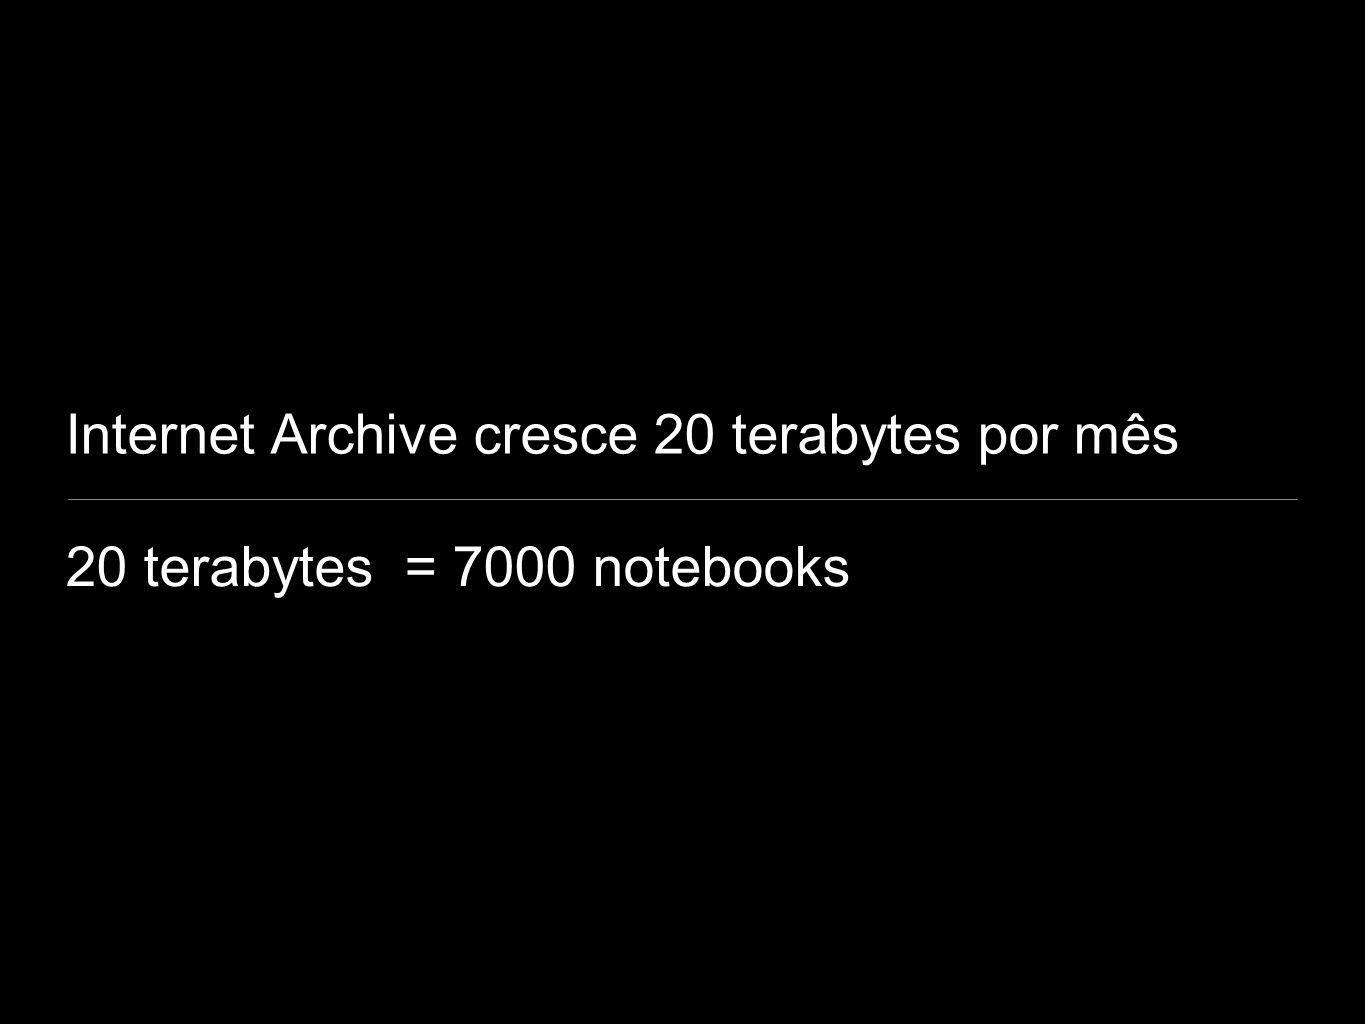 Internet Archive cresce 20 terabytes por mês 20 terabytes = 7000 notebooks